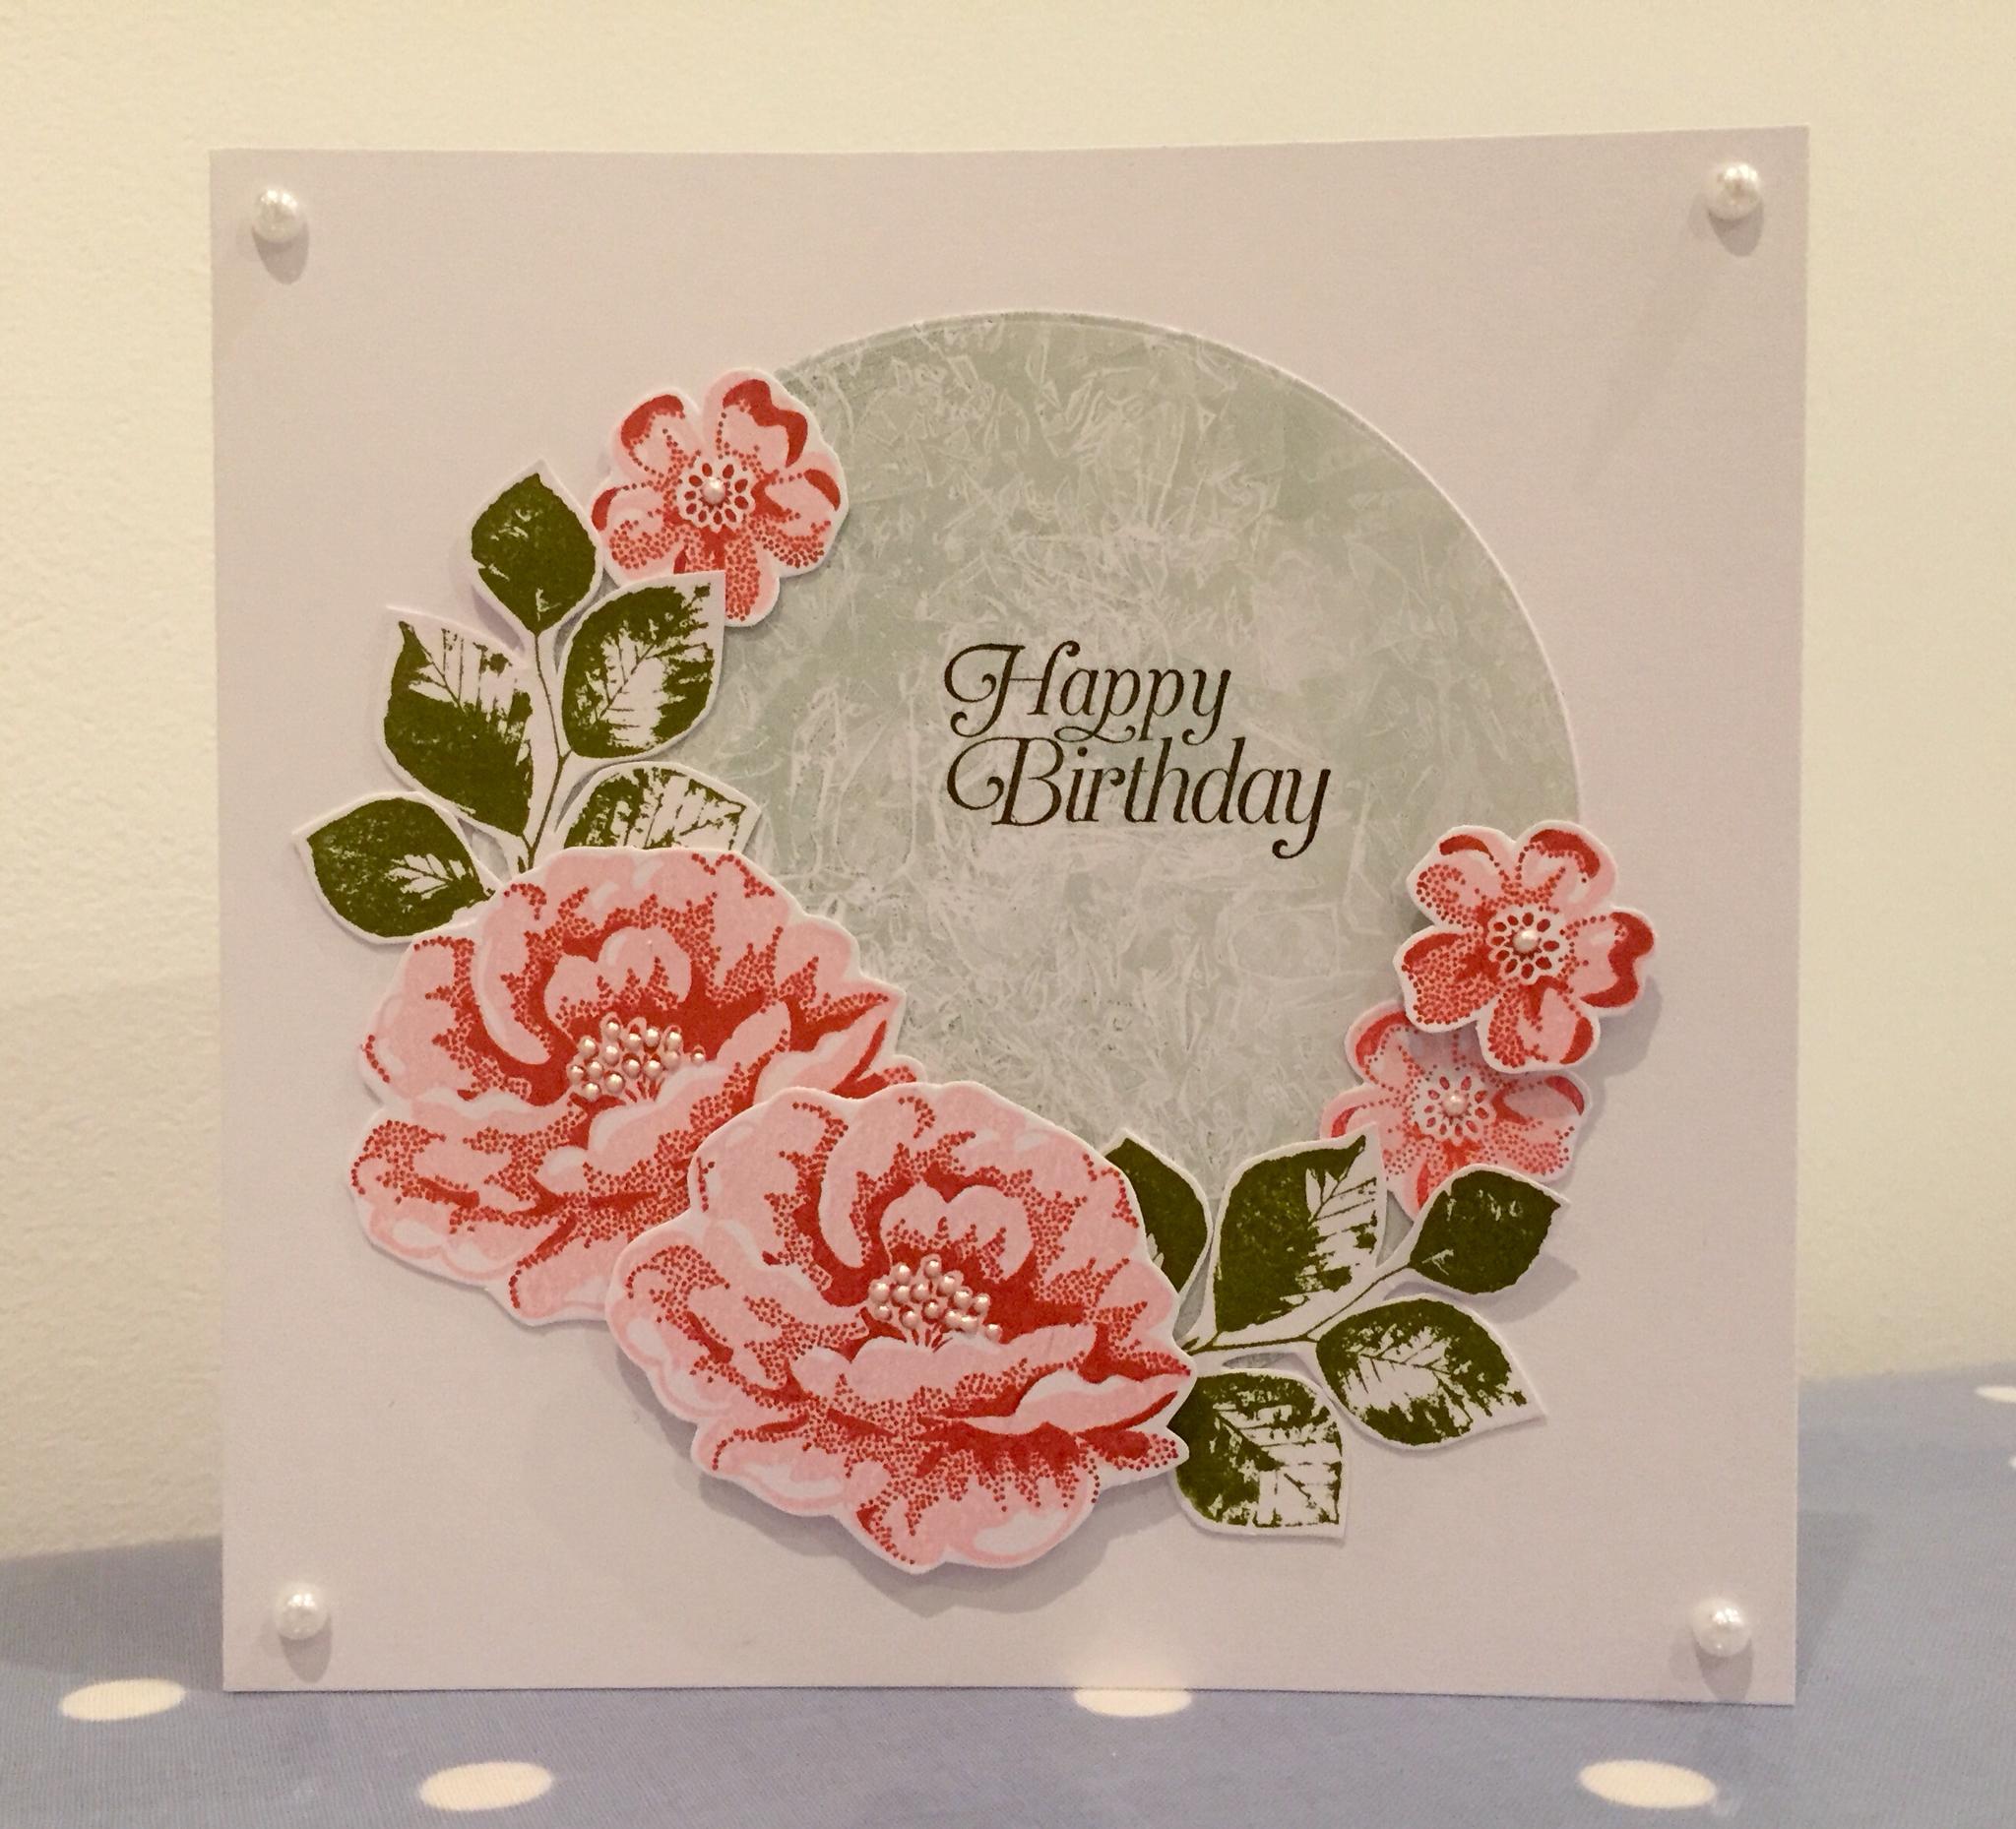 A Cath Kidston inspired card. & Wendy\u0027s Craft: A Cath Kidston inspired card...